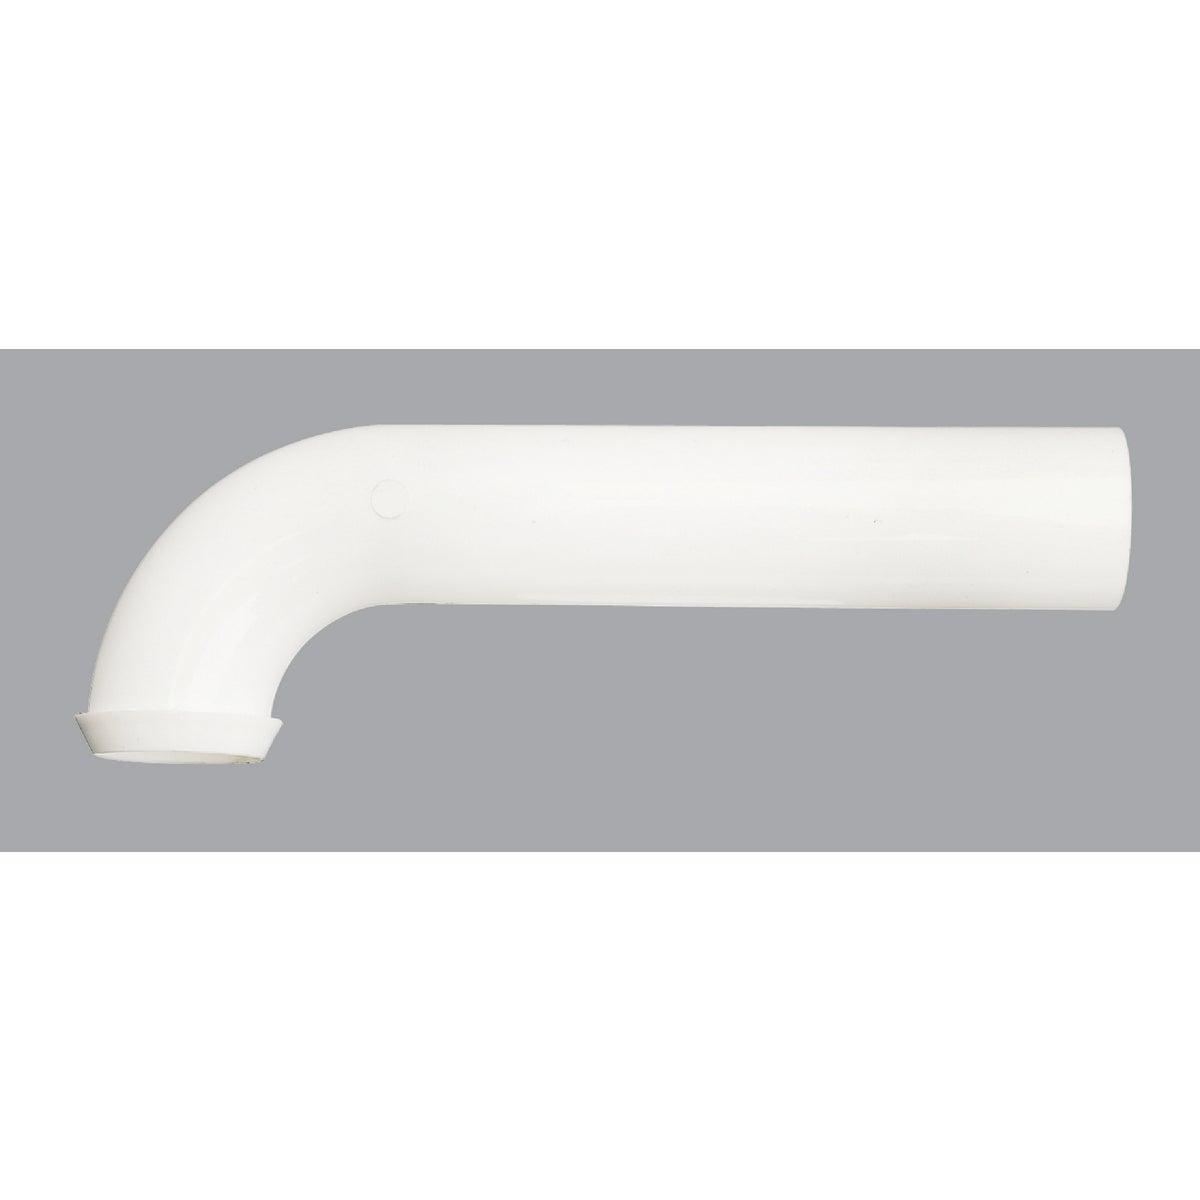 Plumb Pak/Keeney Mfg. 1-1/2X7 PLAST WALL TUBE 730140P